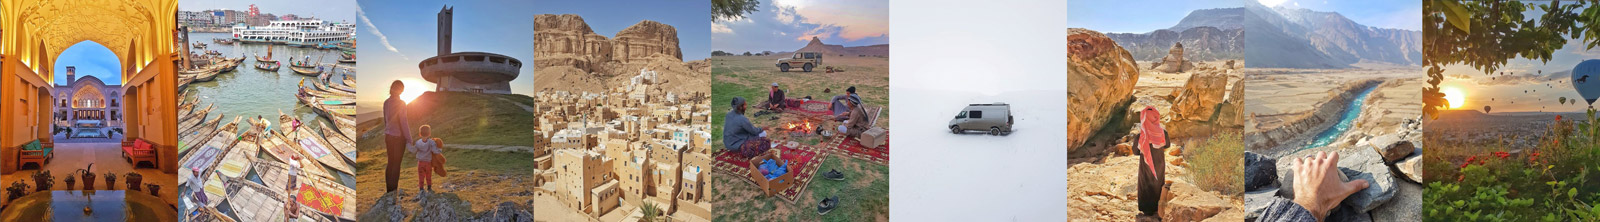 Instagram Nomad Revelations Travel Blog